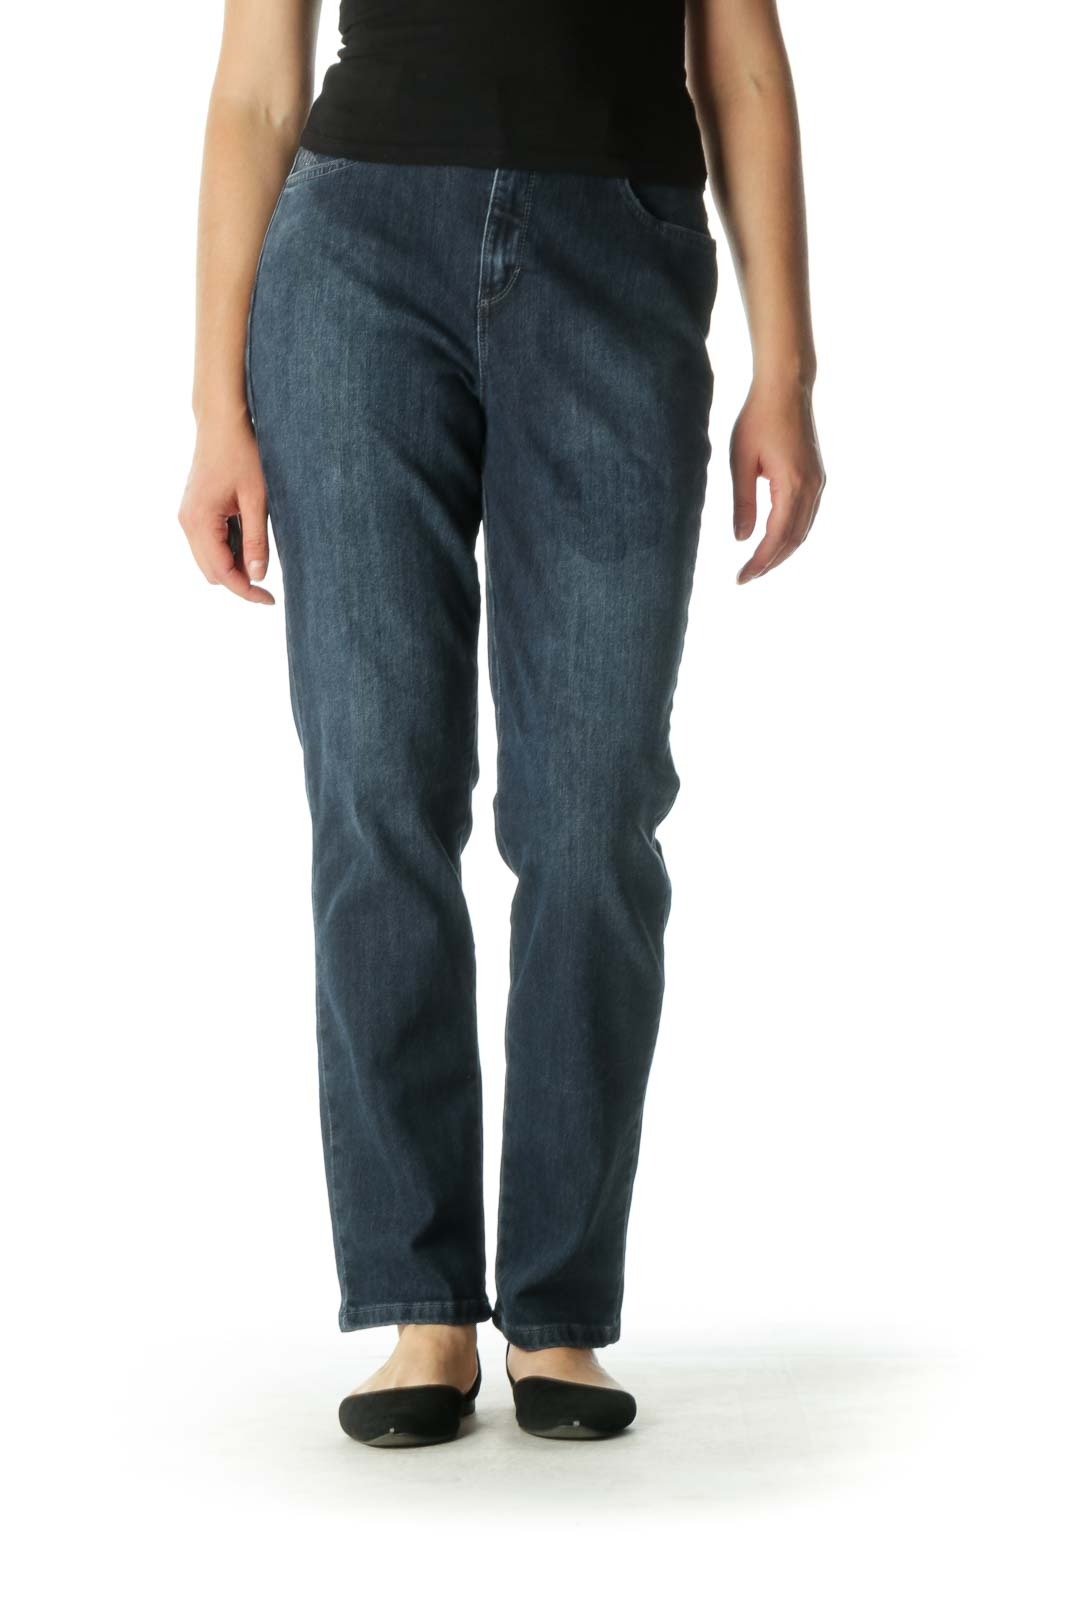 Blue Embellished Tapered Jeans Front